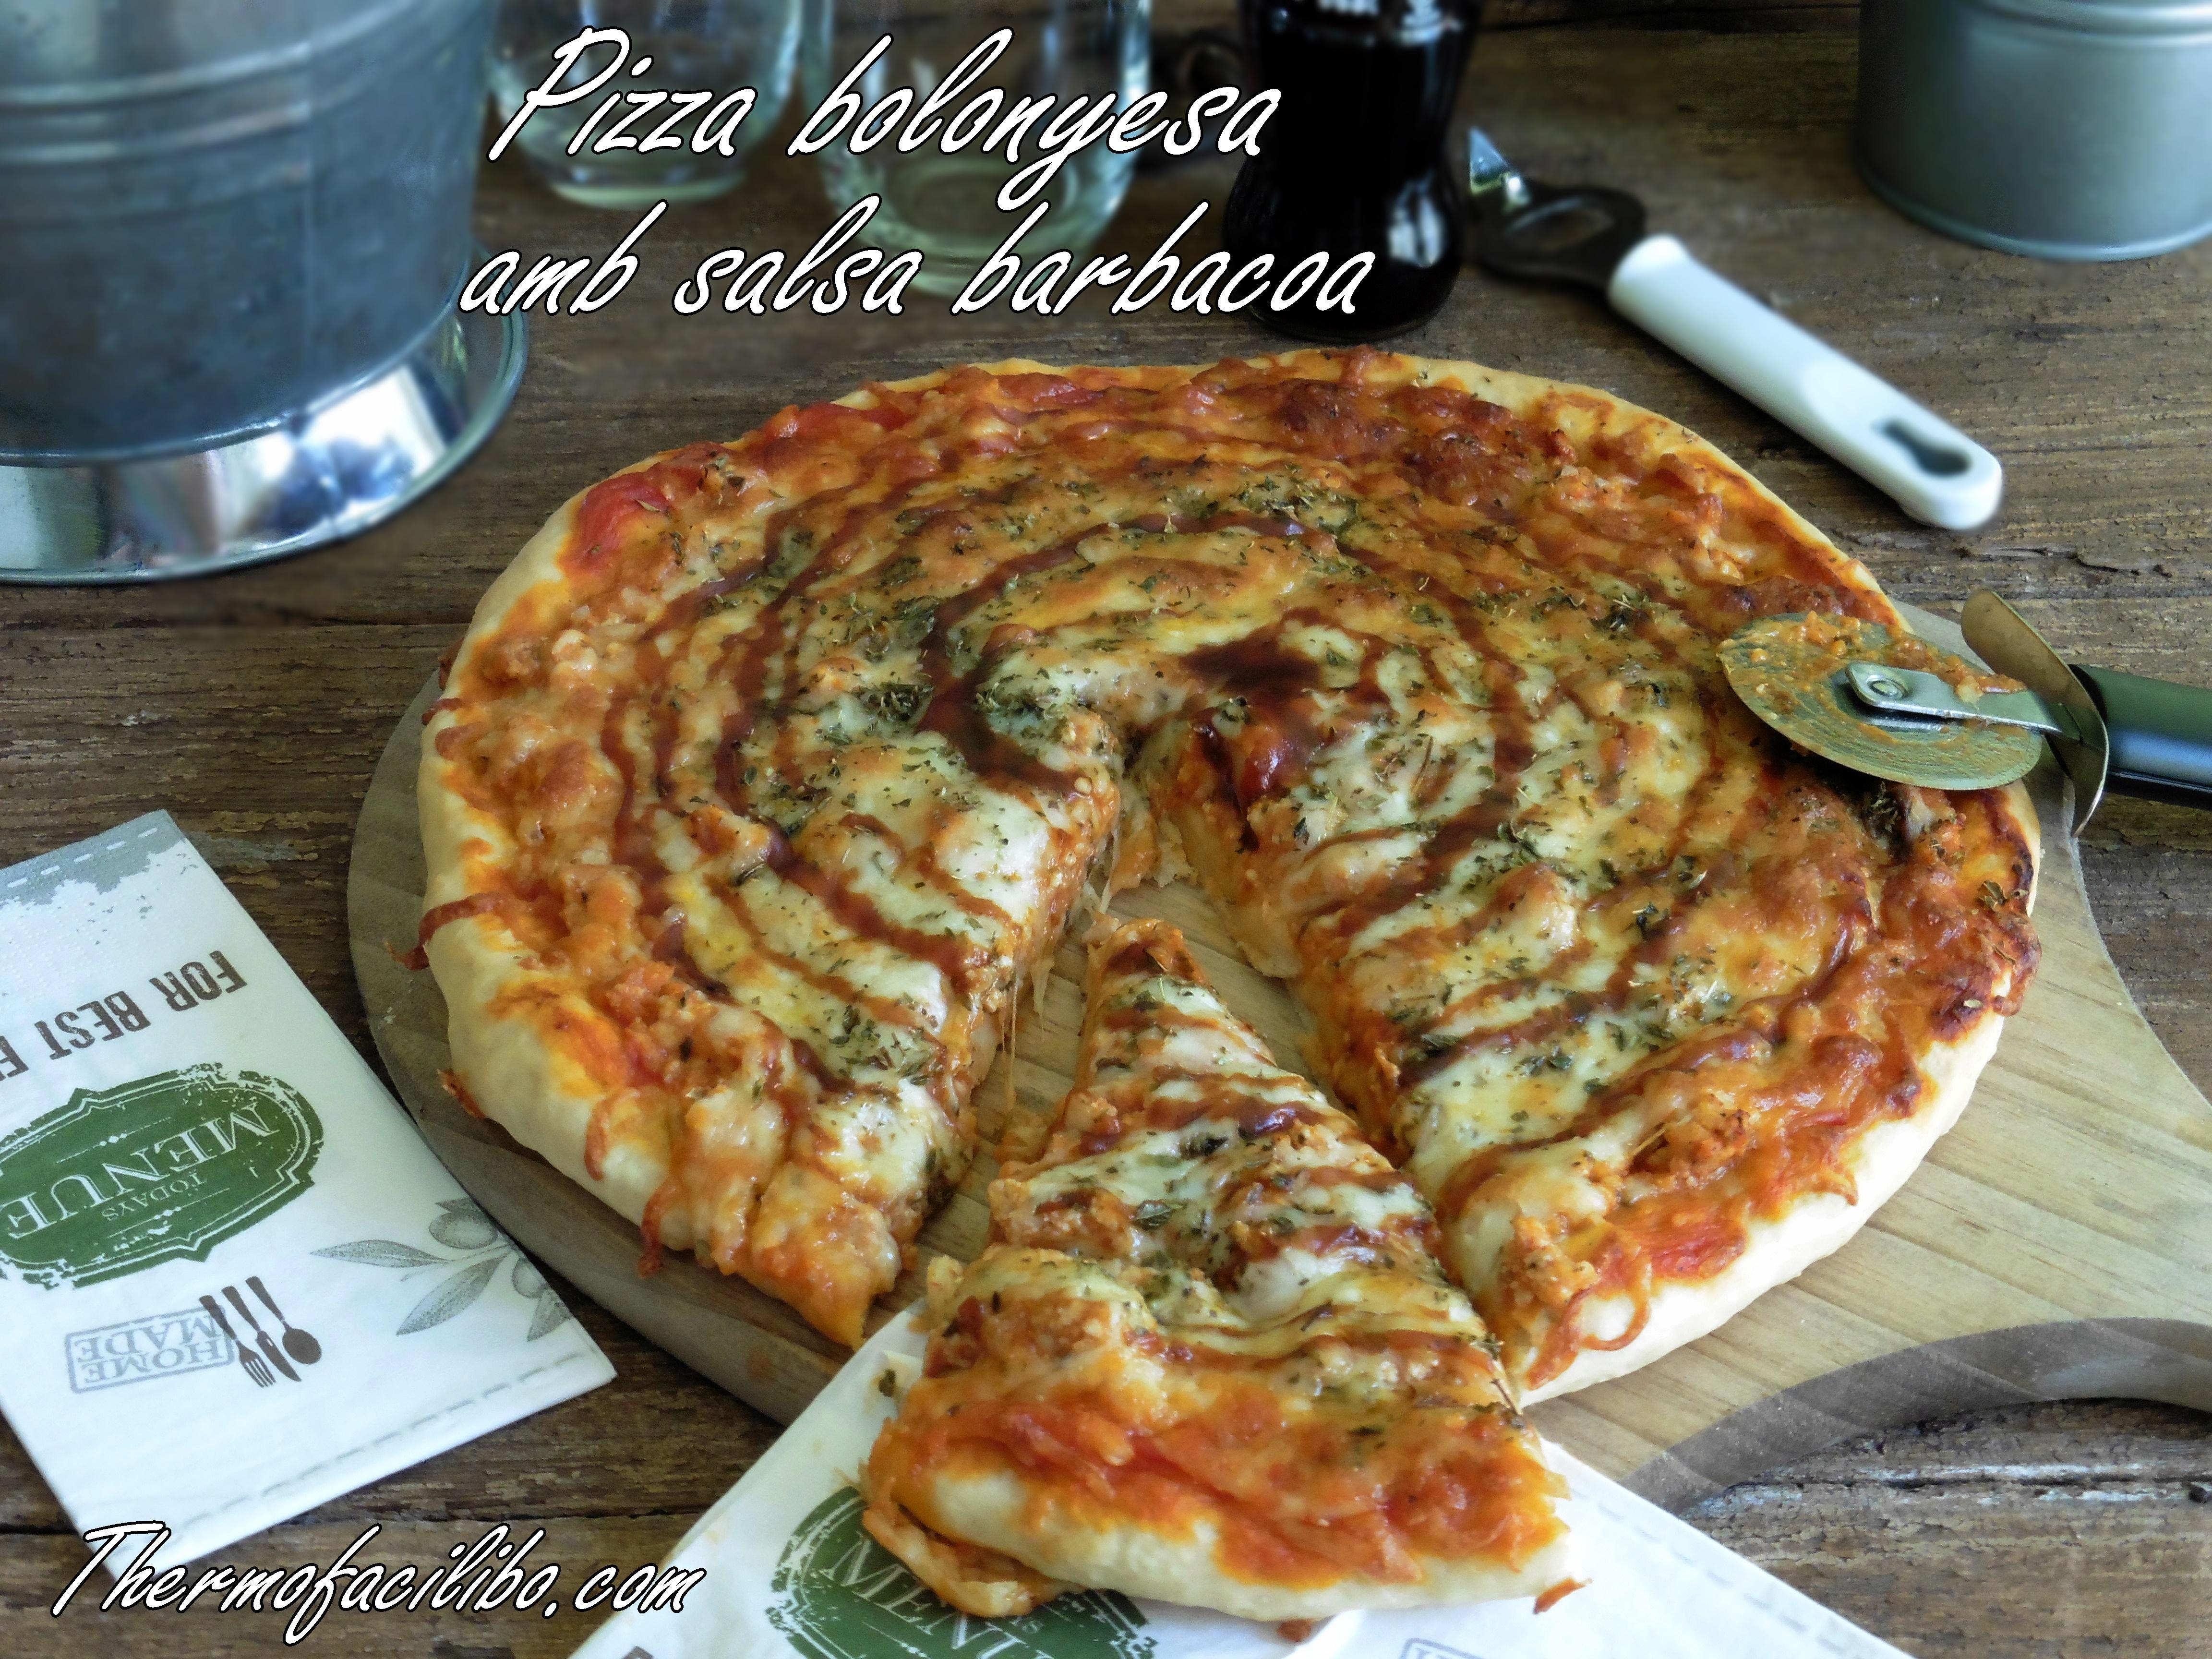 Pizza bolonyesa amb salsa barbacoa.1